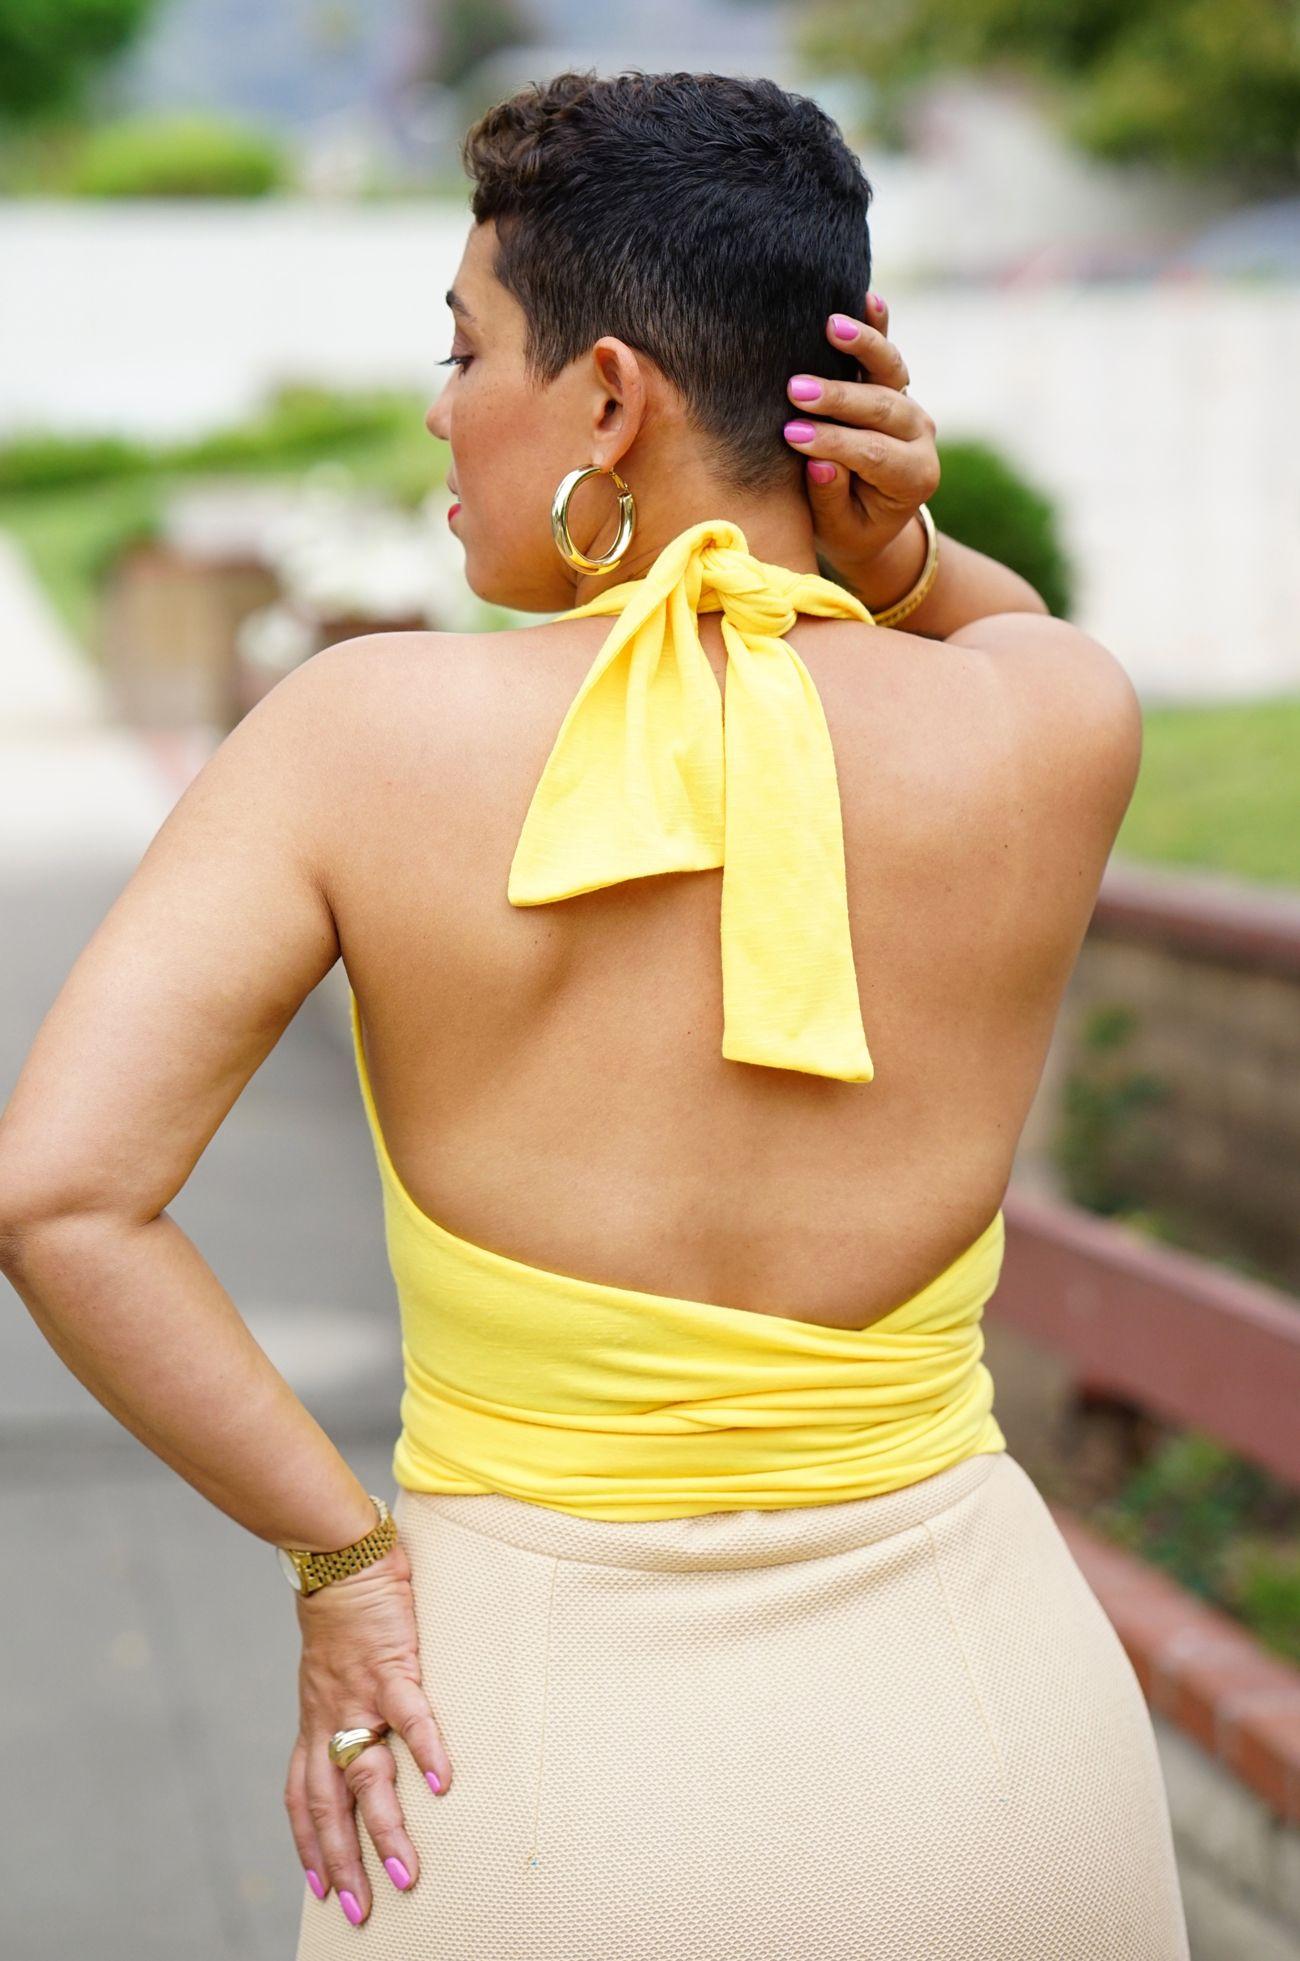 Diy tie front top wrap skirt using vogue simplicity